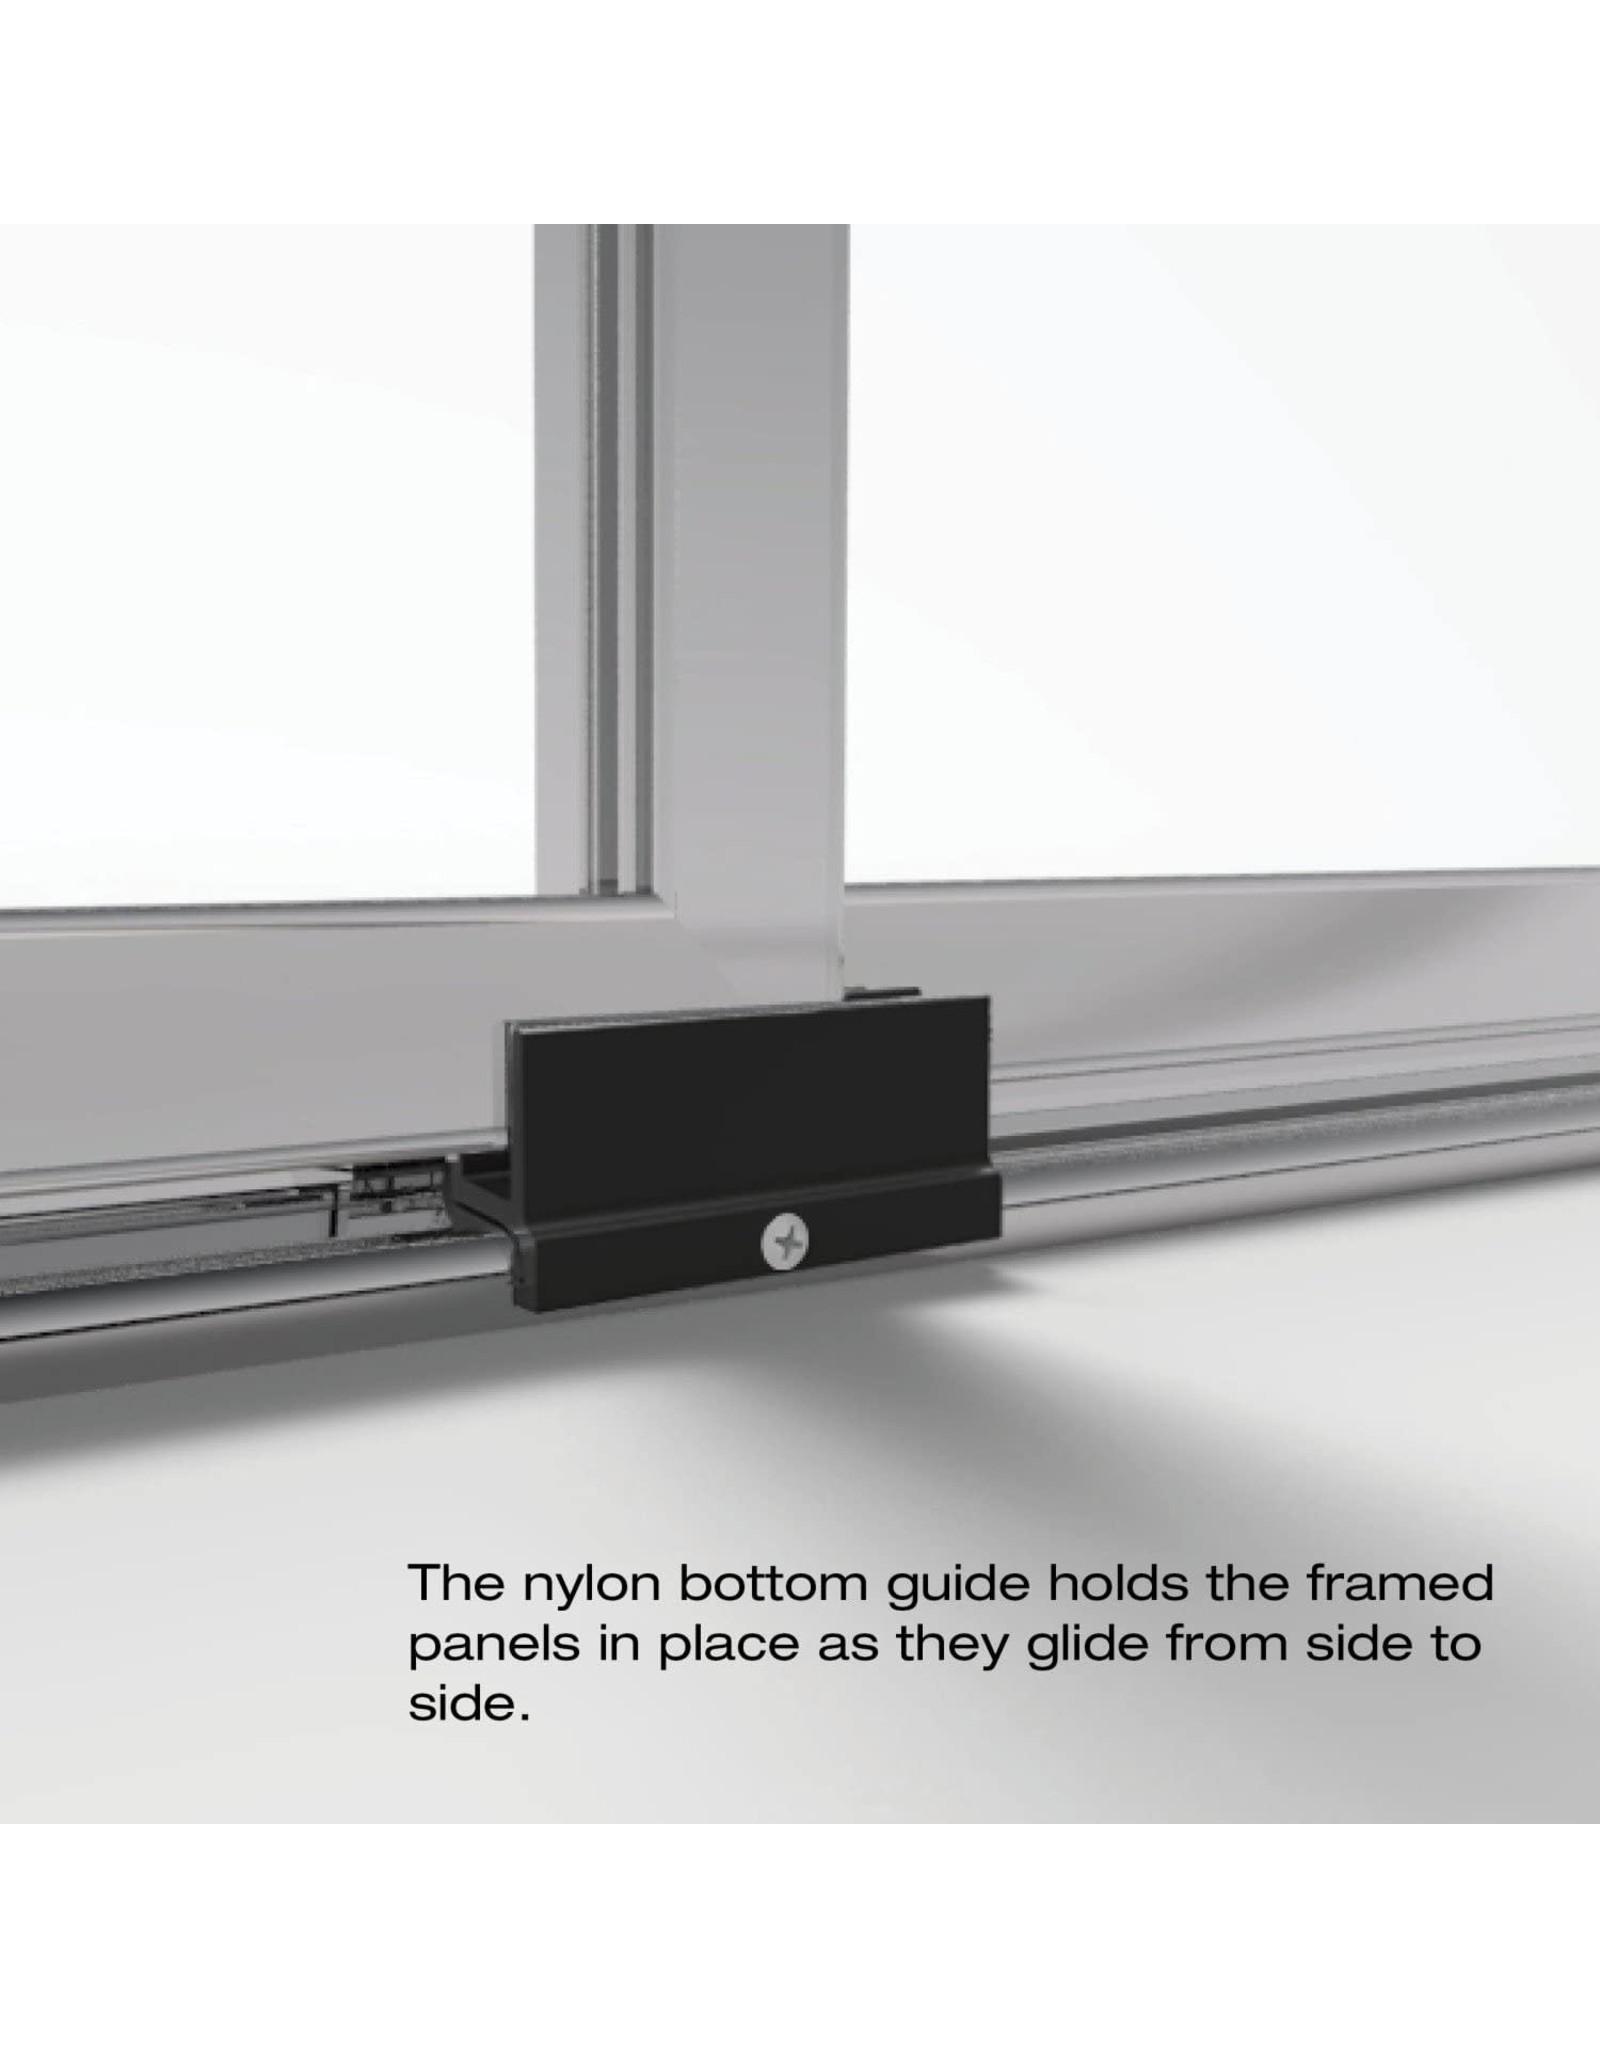 Basco Shower Door Basco Deluxe Framed Sliding Shower Door, Fits 45-47 inch opening, Clear Glass, Silver Finish